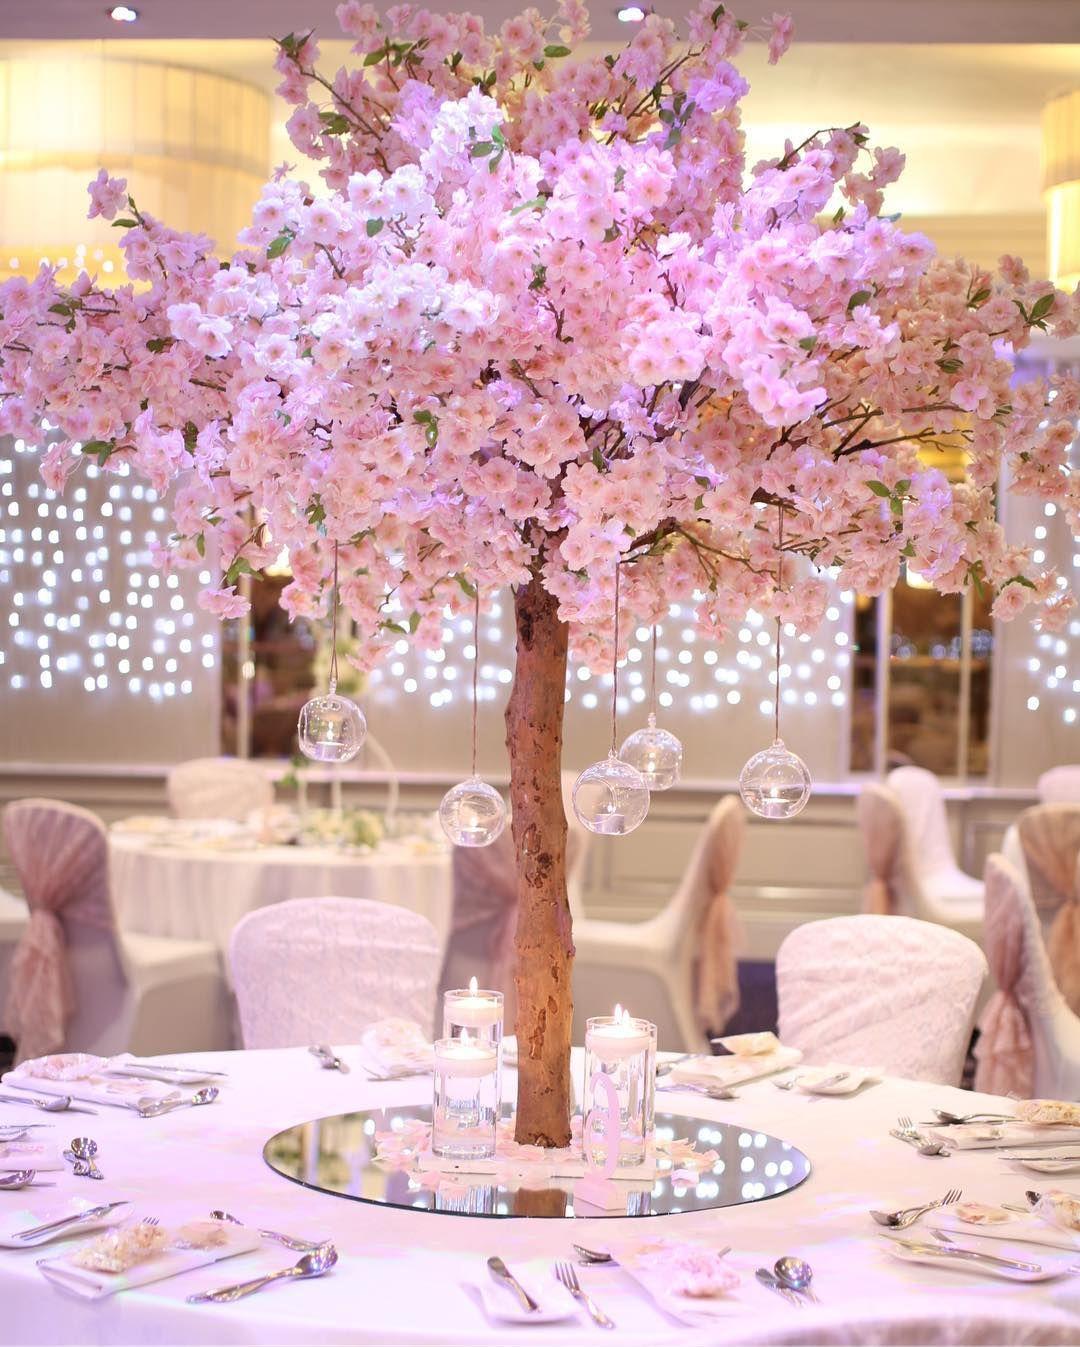 No Filter Need For These Beauties Grosvenorpulfordhotel Weddinginspo Blossomtr Cherry Blossom Wedding Theme Tree Centrepiece Wedding Blossom Tree Wedding